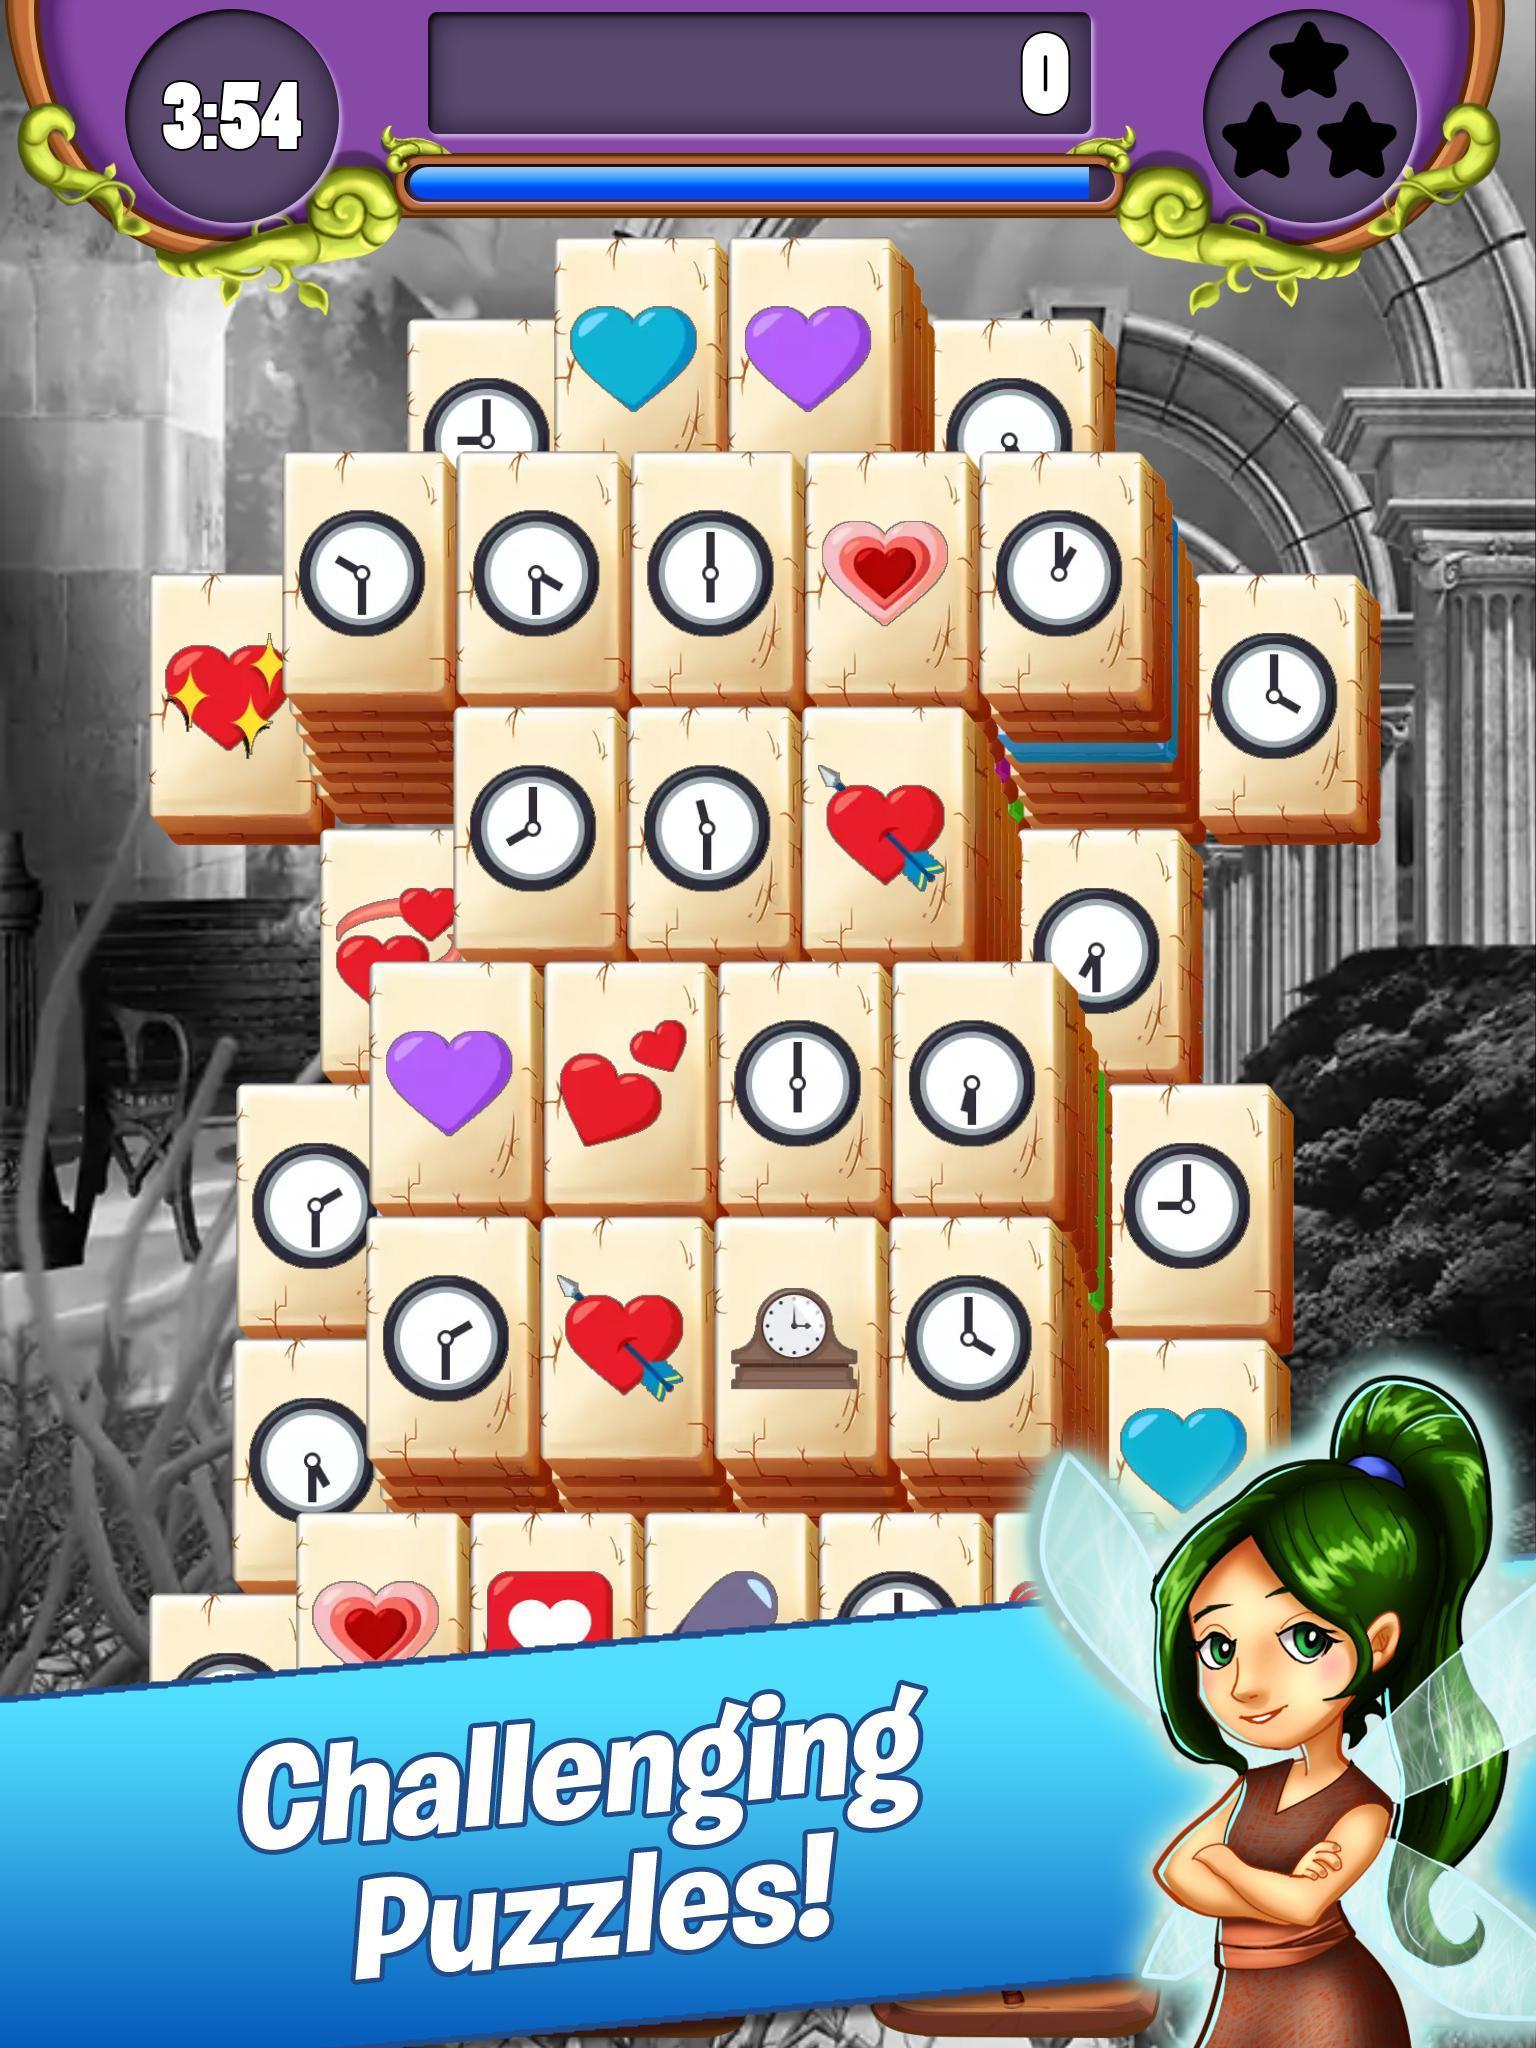 Mahjong - Mermaid Quest - Sirens of the Deep 1.0.42 Screenshot 9